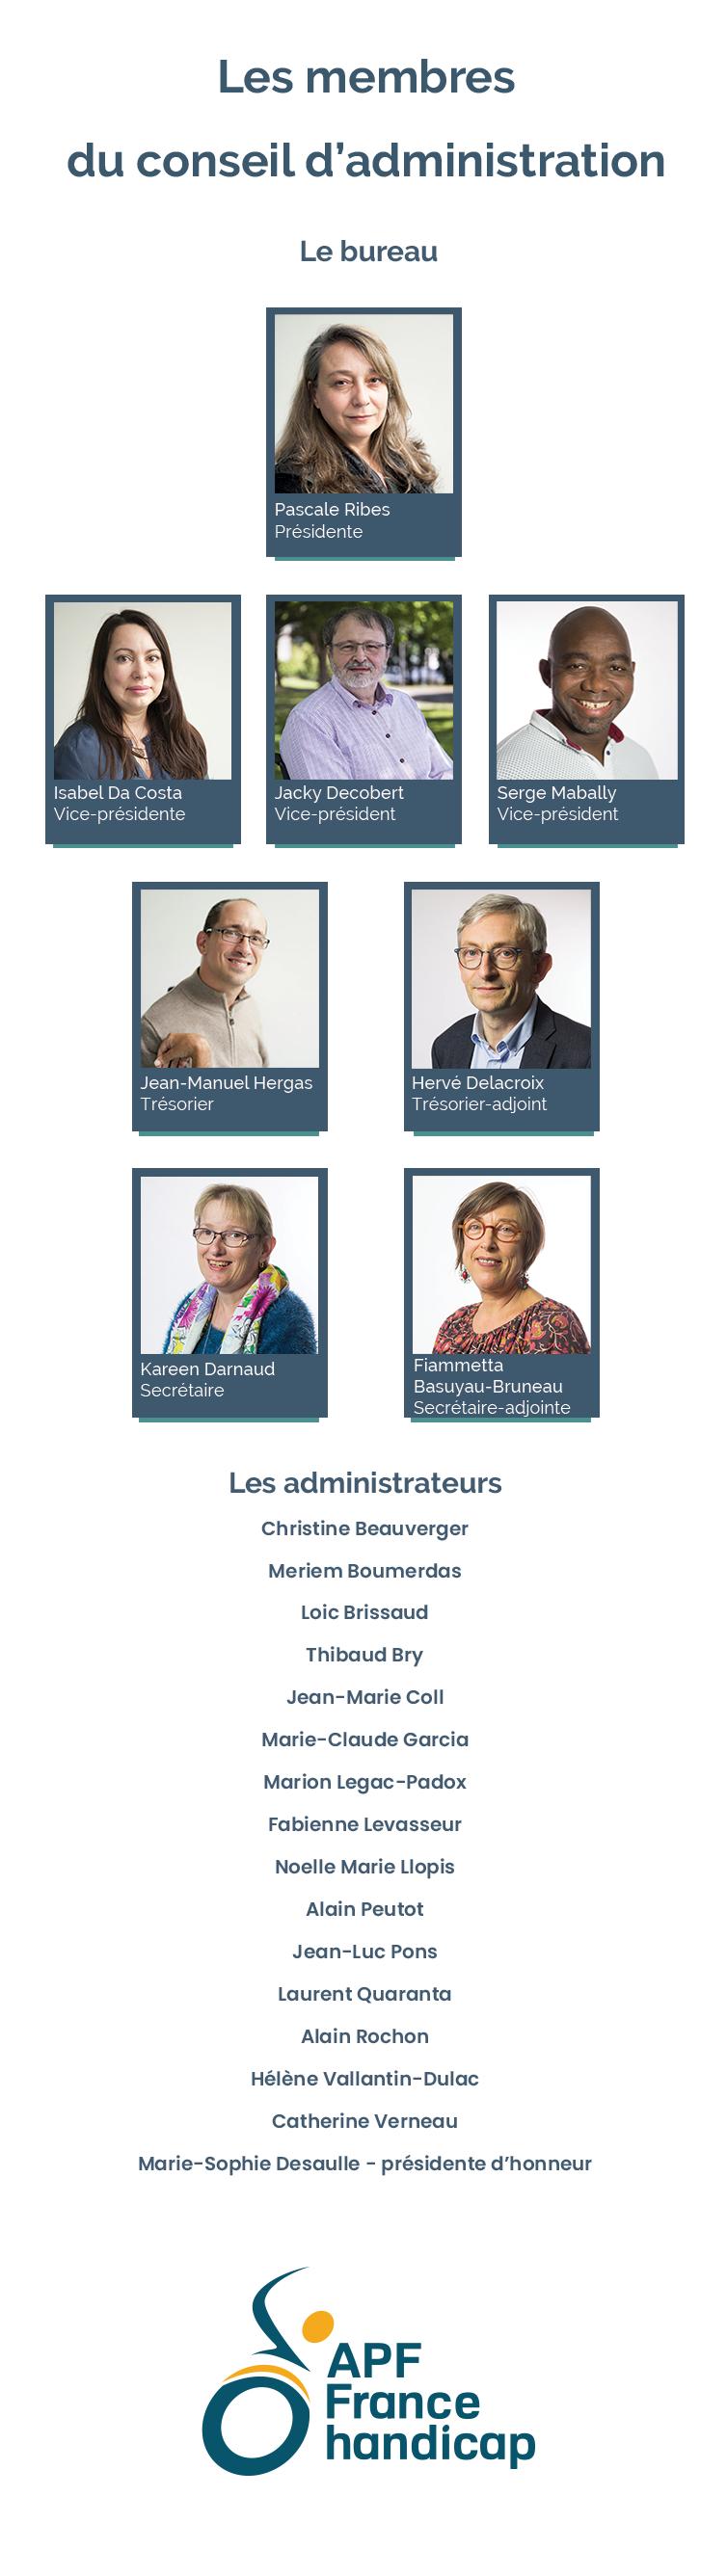 les membres du conseil d'administration APF France handicap